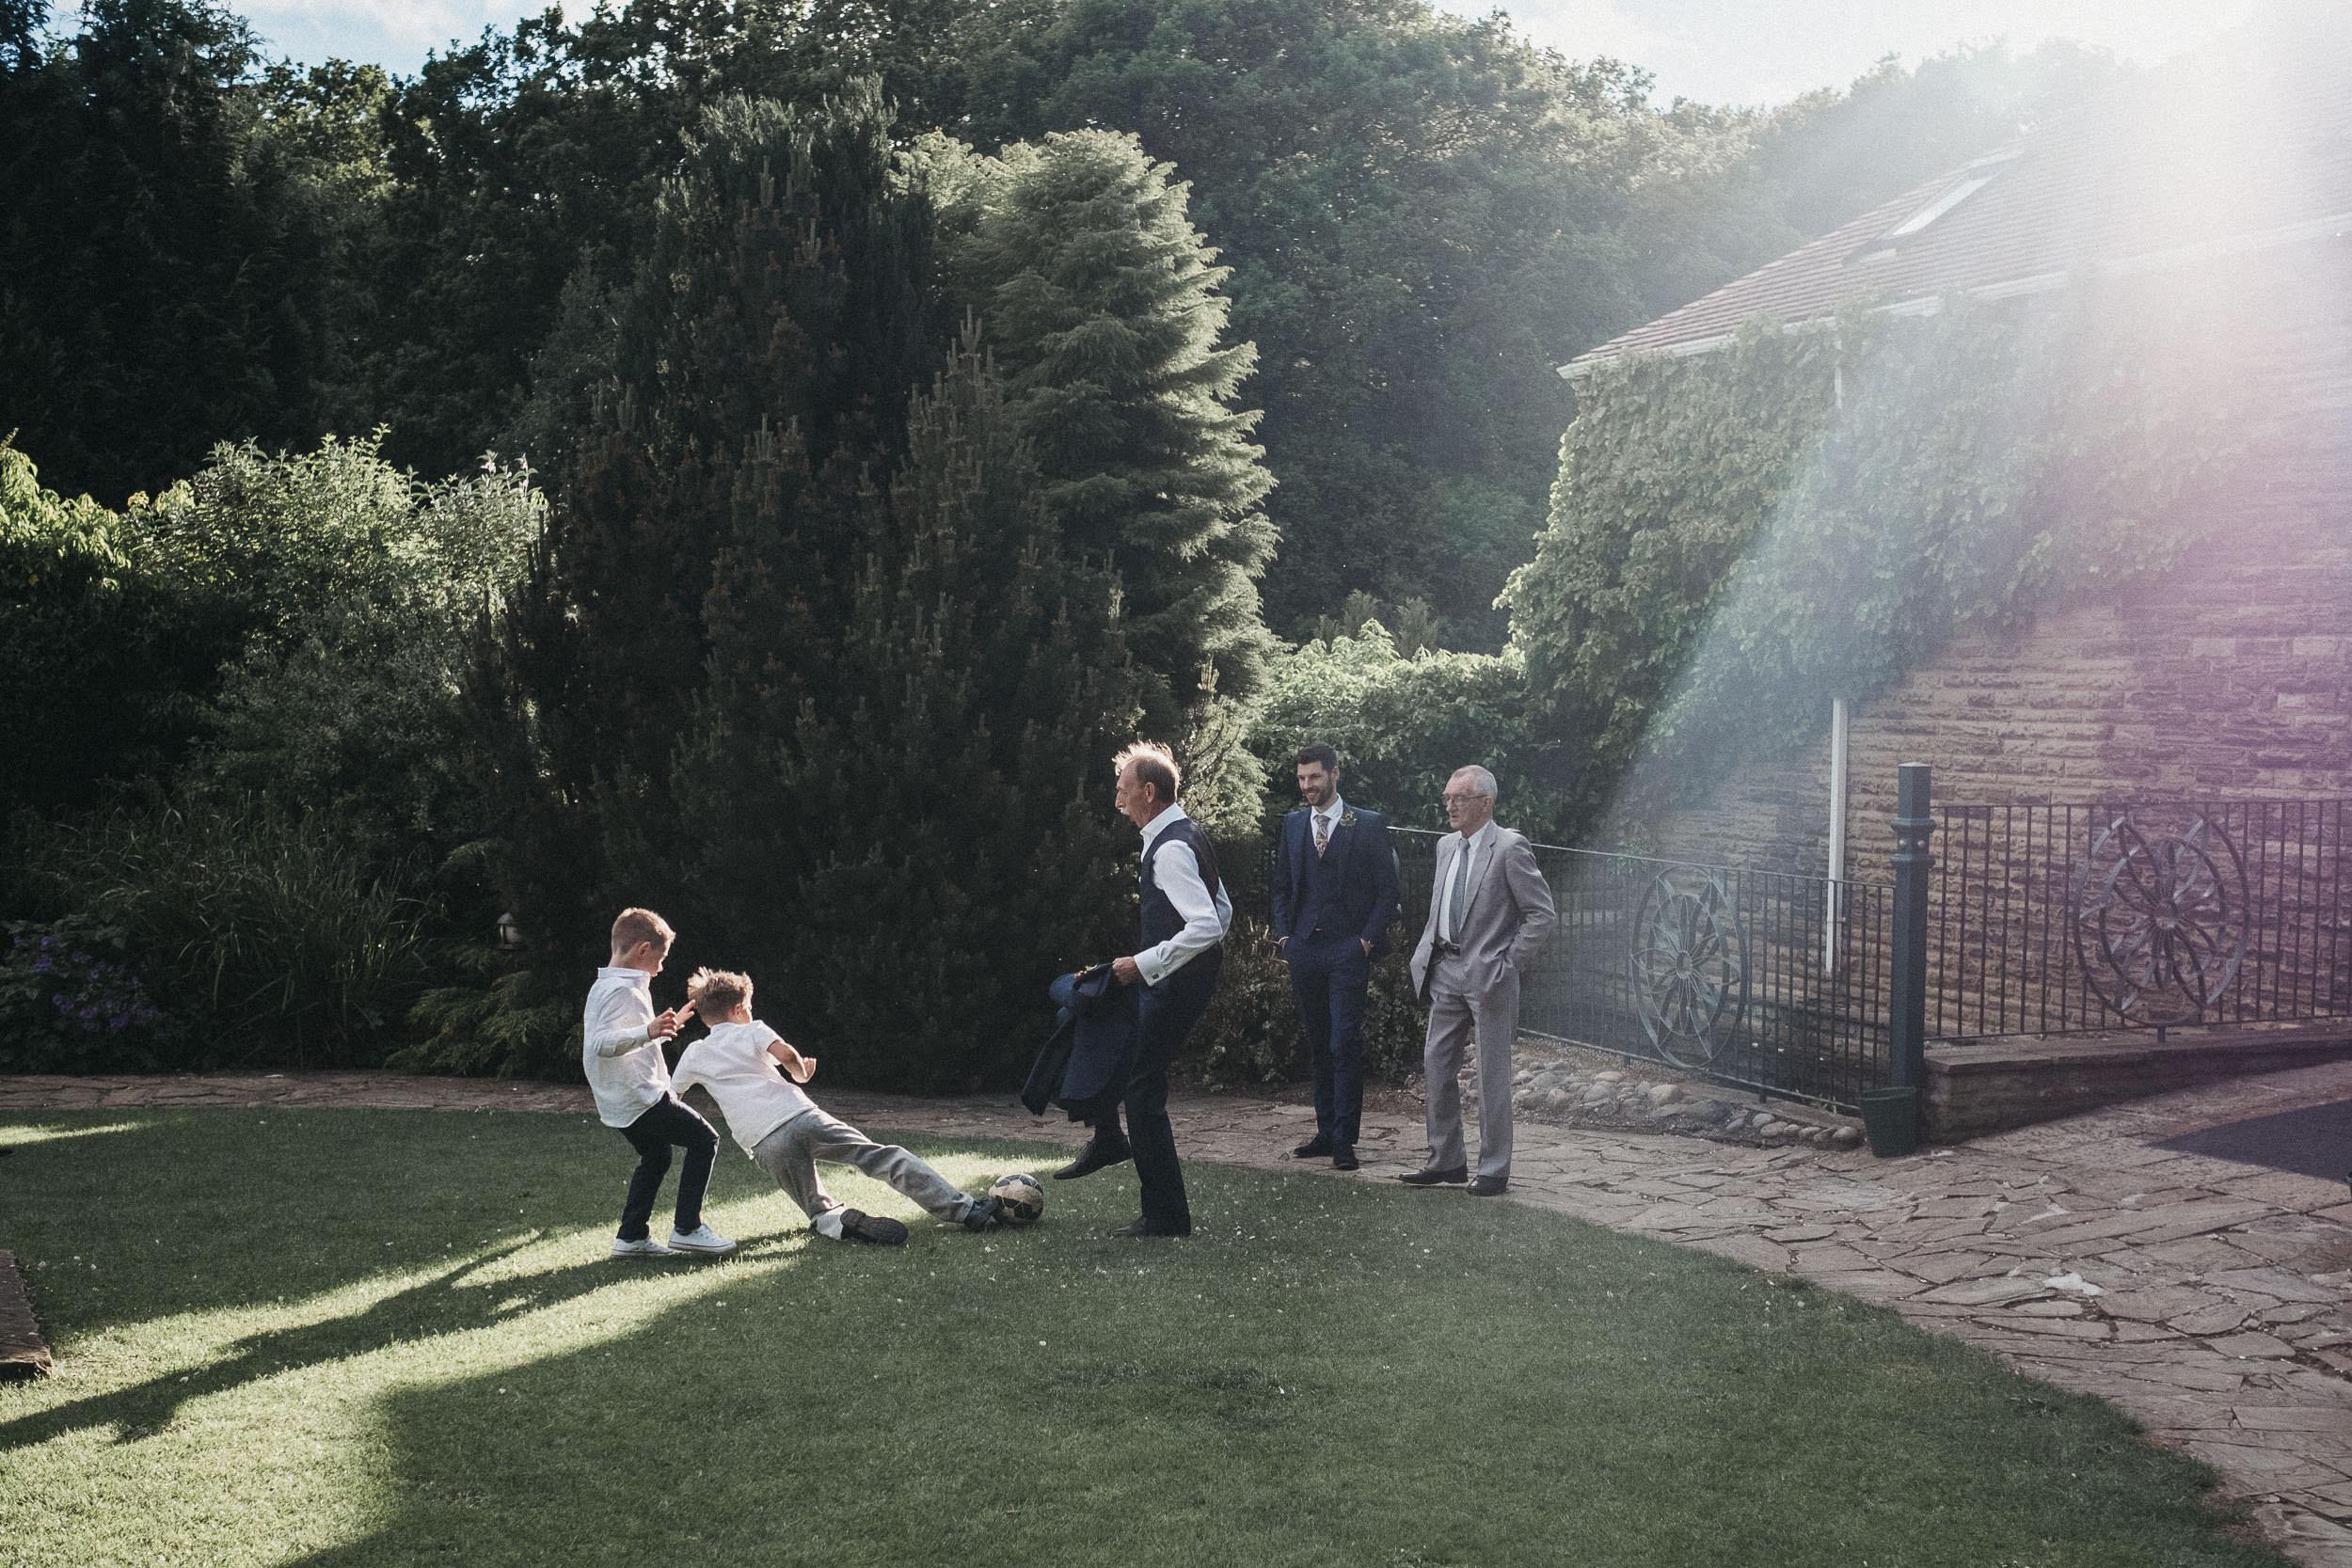 Wedding guests play football in blazing sunlight